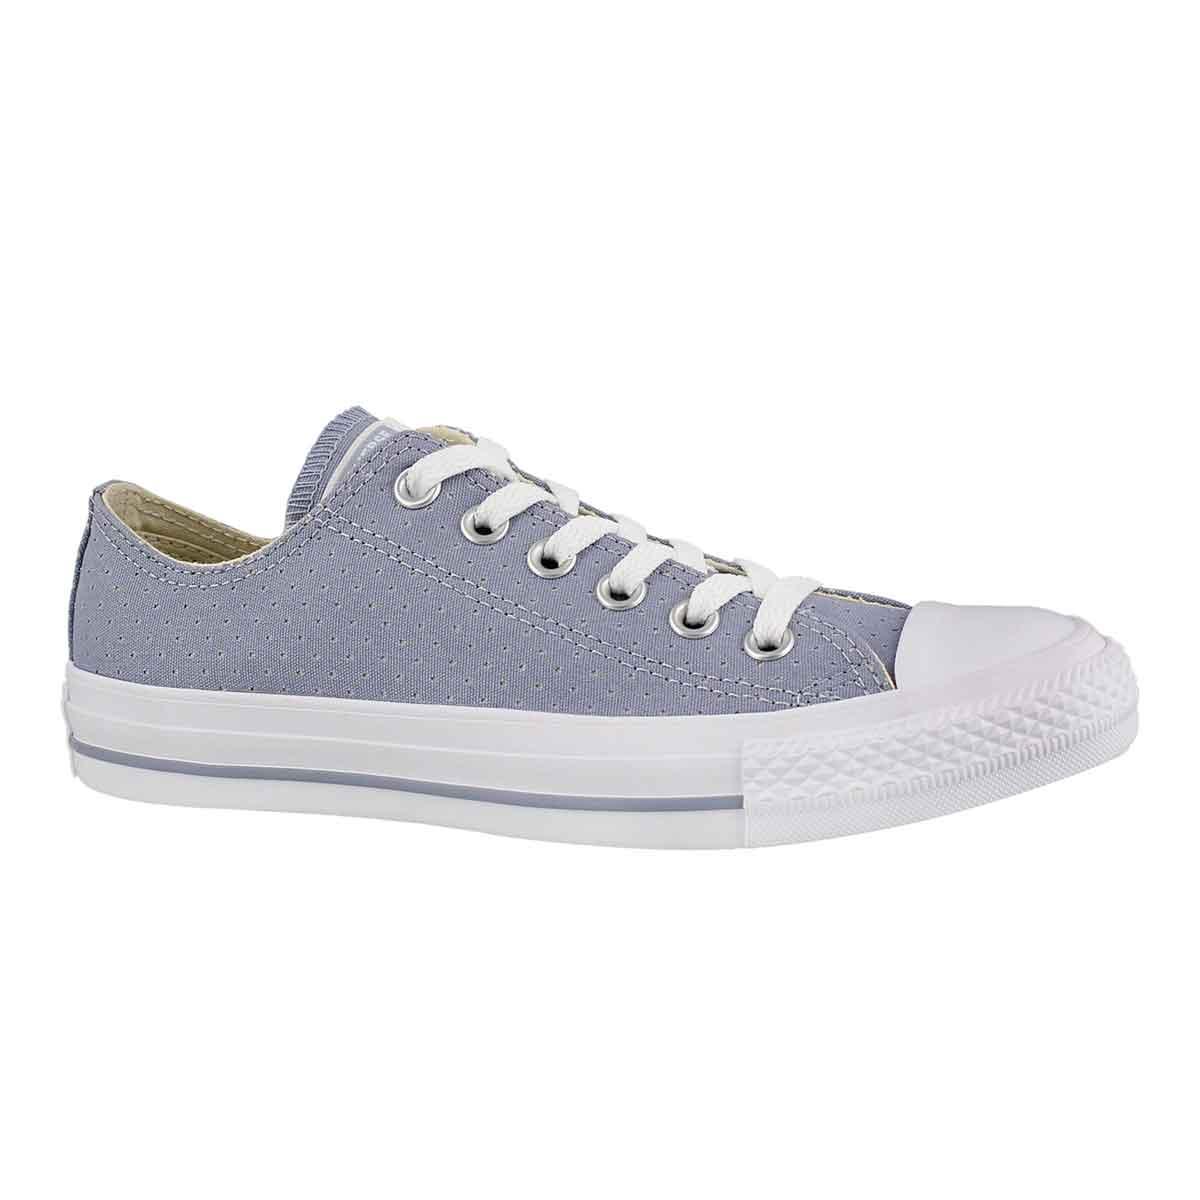 Women's CT ALL STAR SEASONAL glacier grey sneakers